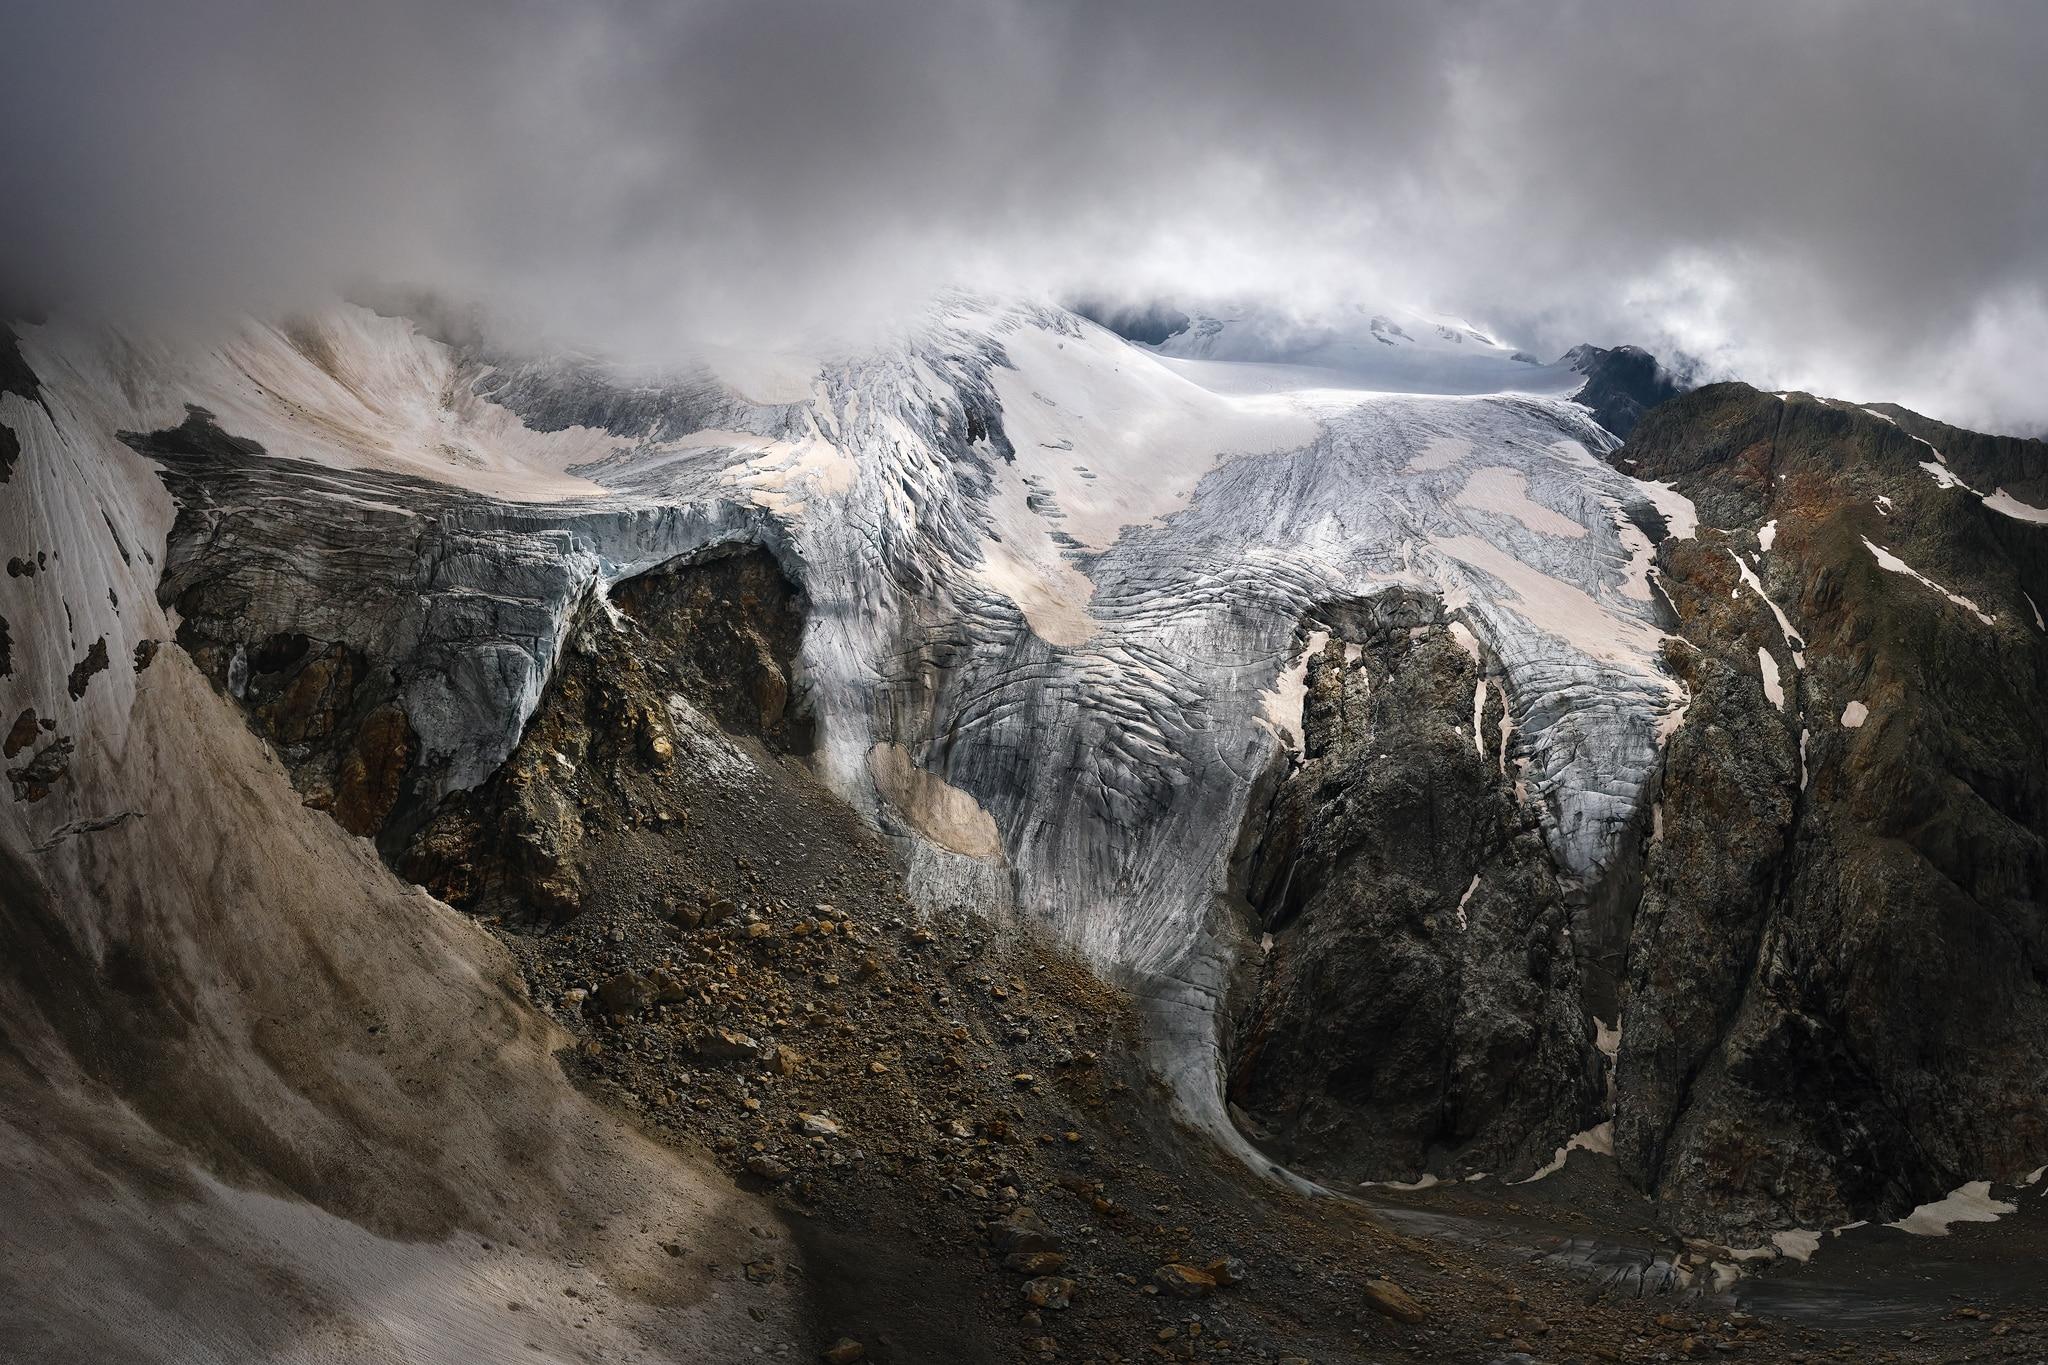 Luftaufnahme - Panorama - Steingletscher - Sustenpass